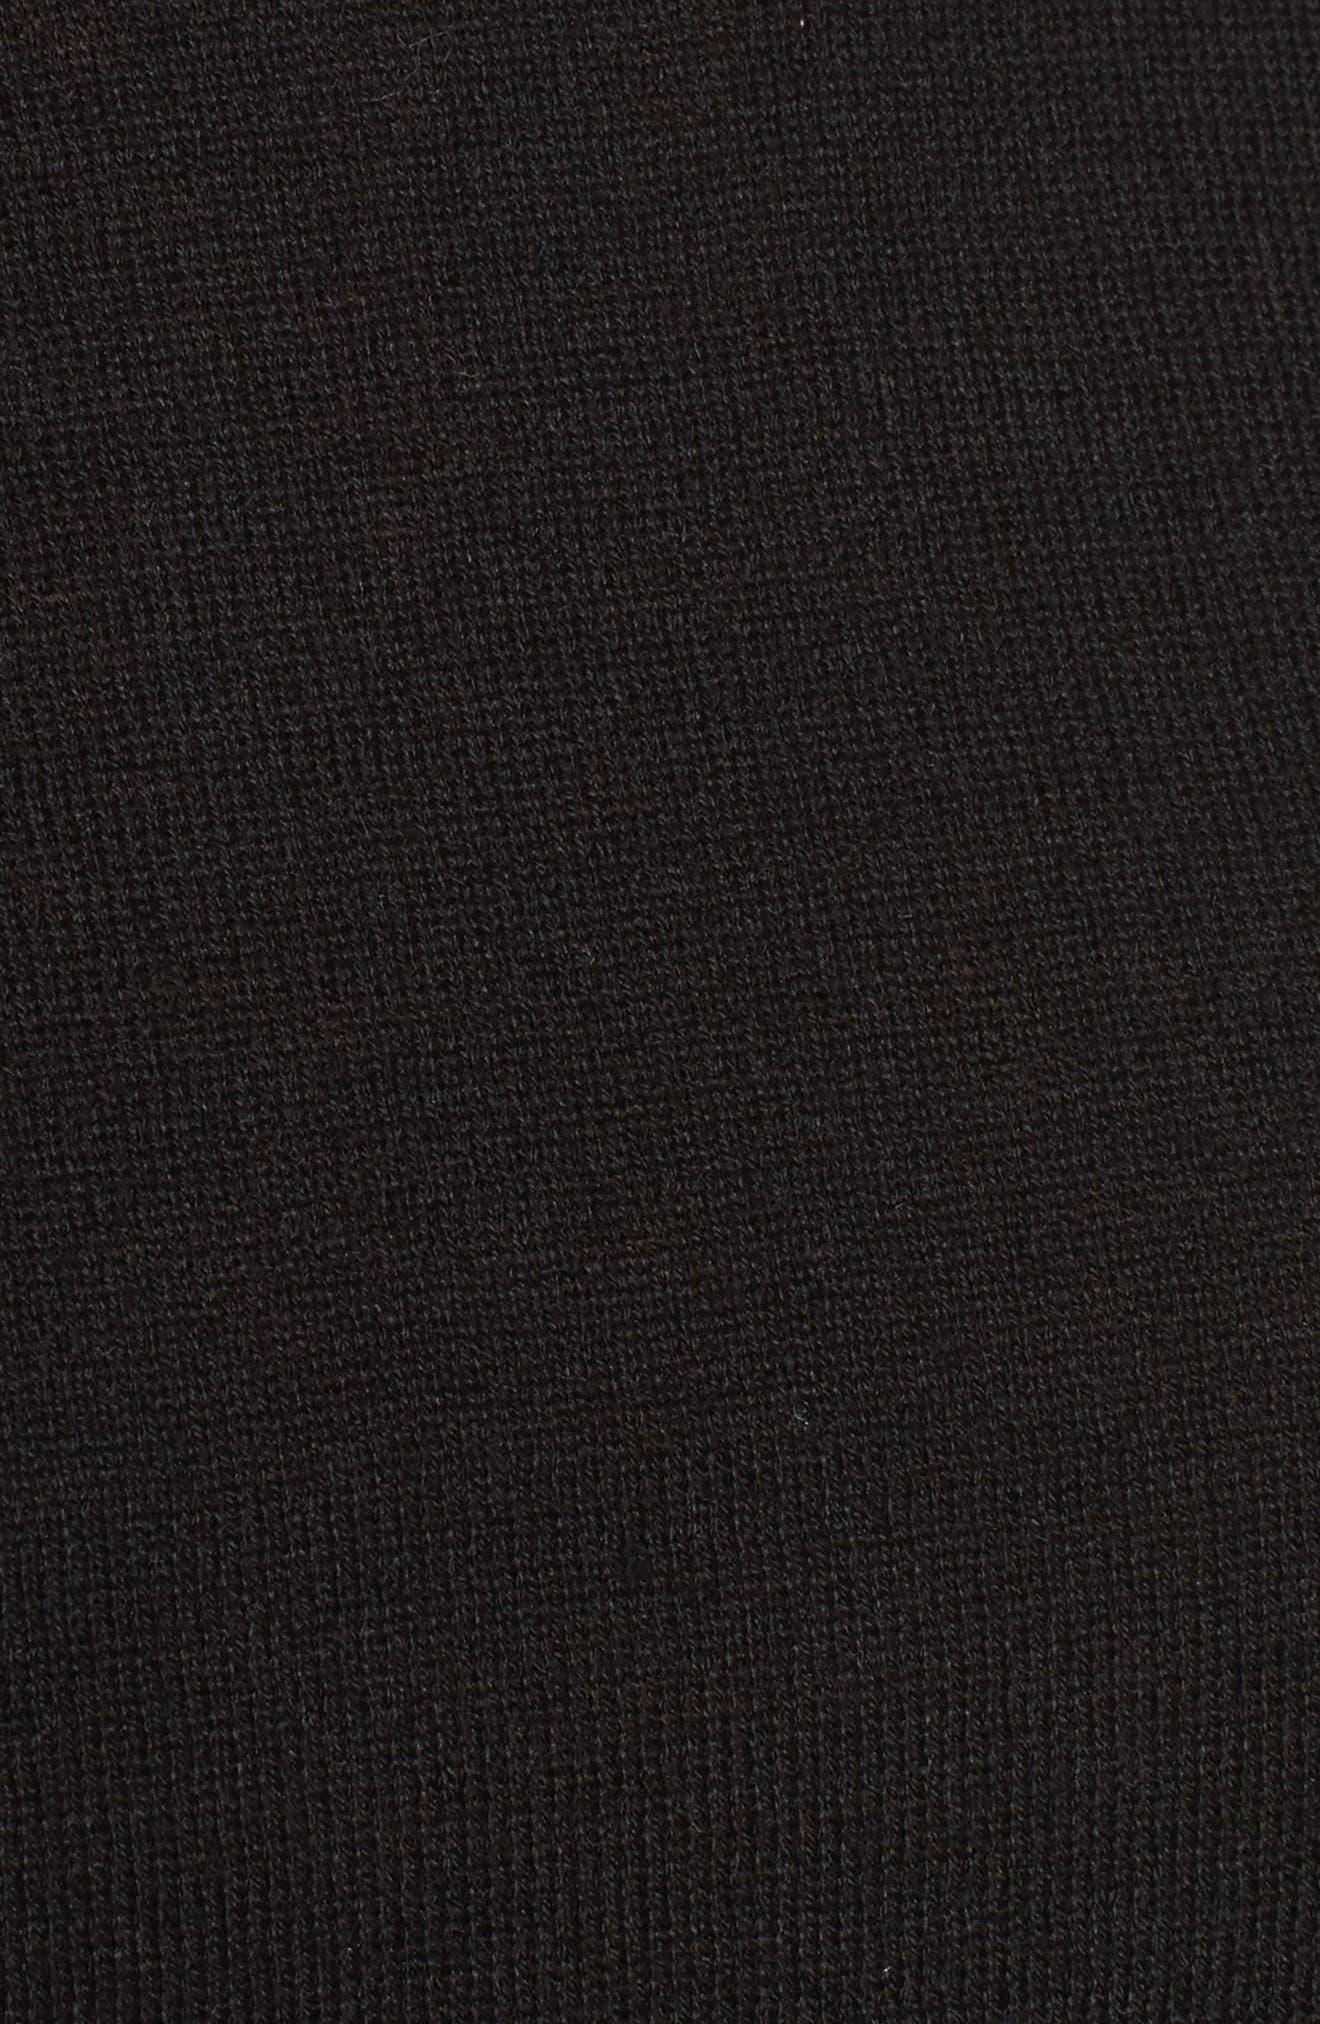 Cotton Blend Pullover,                             Alternate thumbnail 39, color,